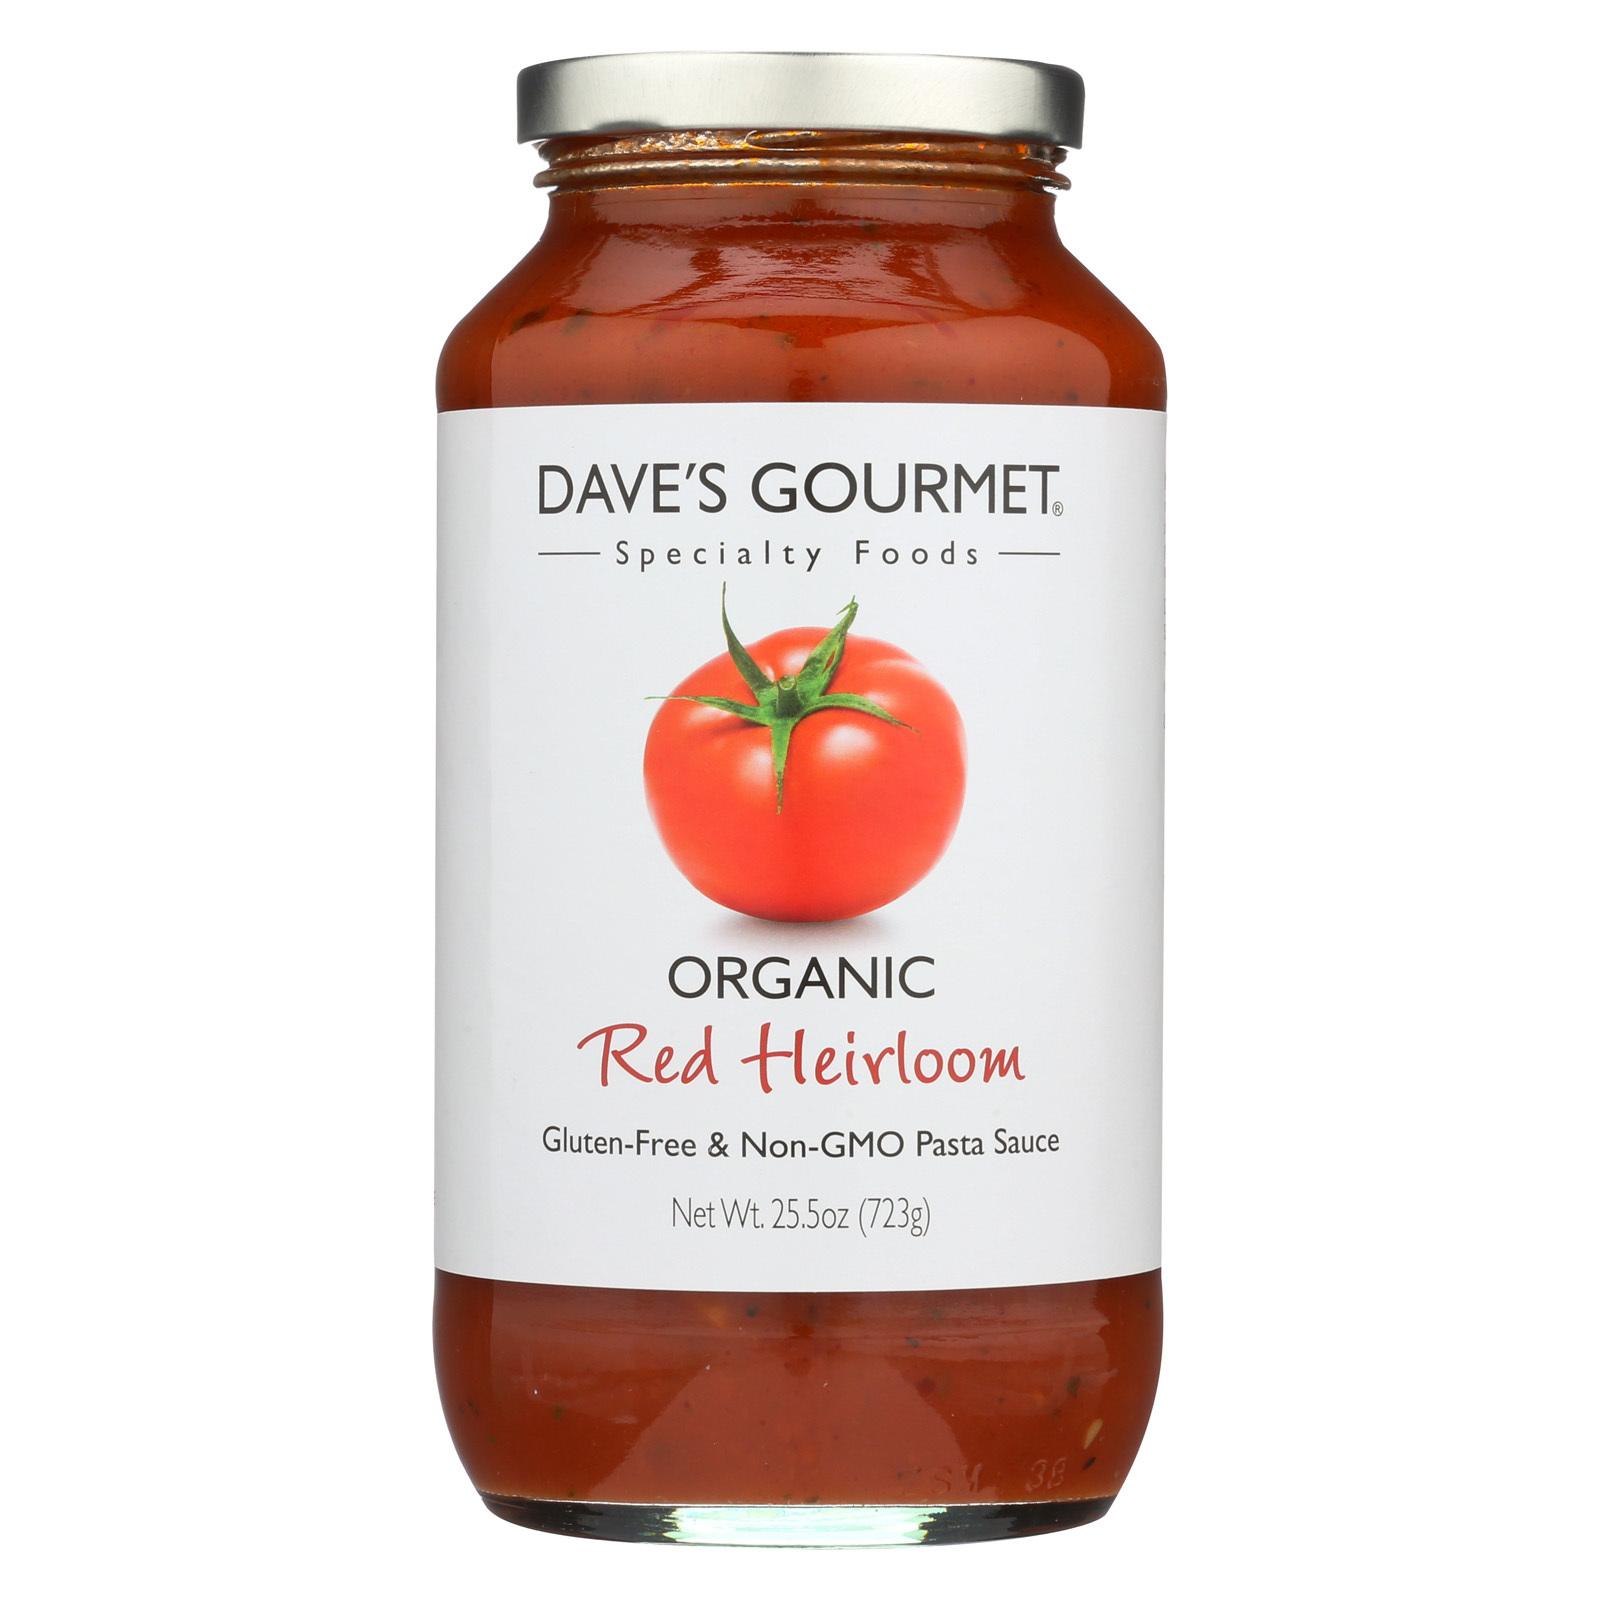 Dave's Gourmet Organic Red Heirloom Pasta Sauce - Case of 6 - 25.5 FL oz.